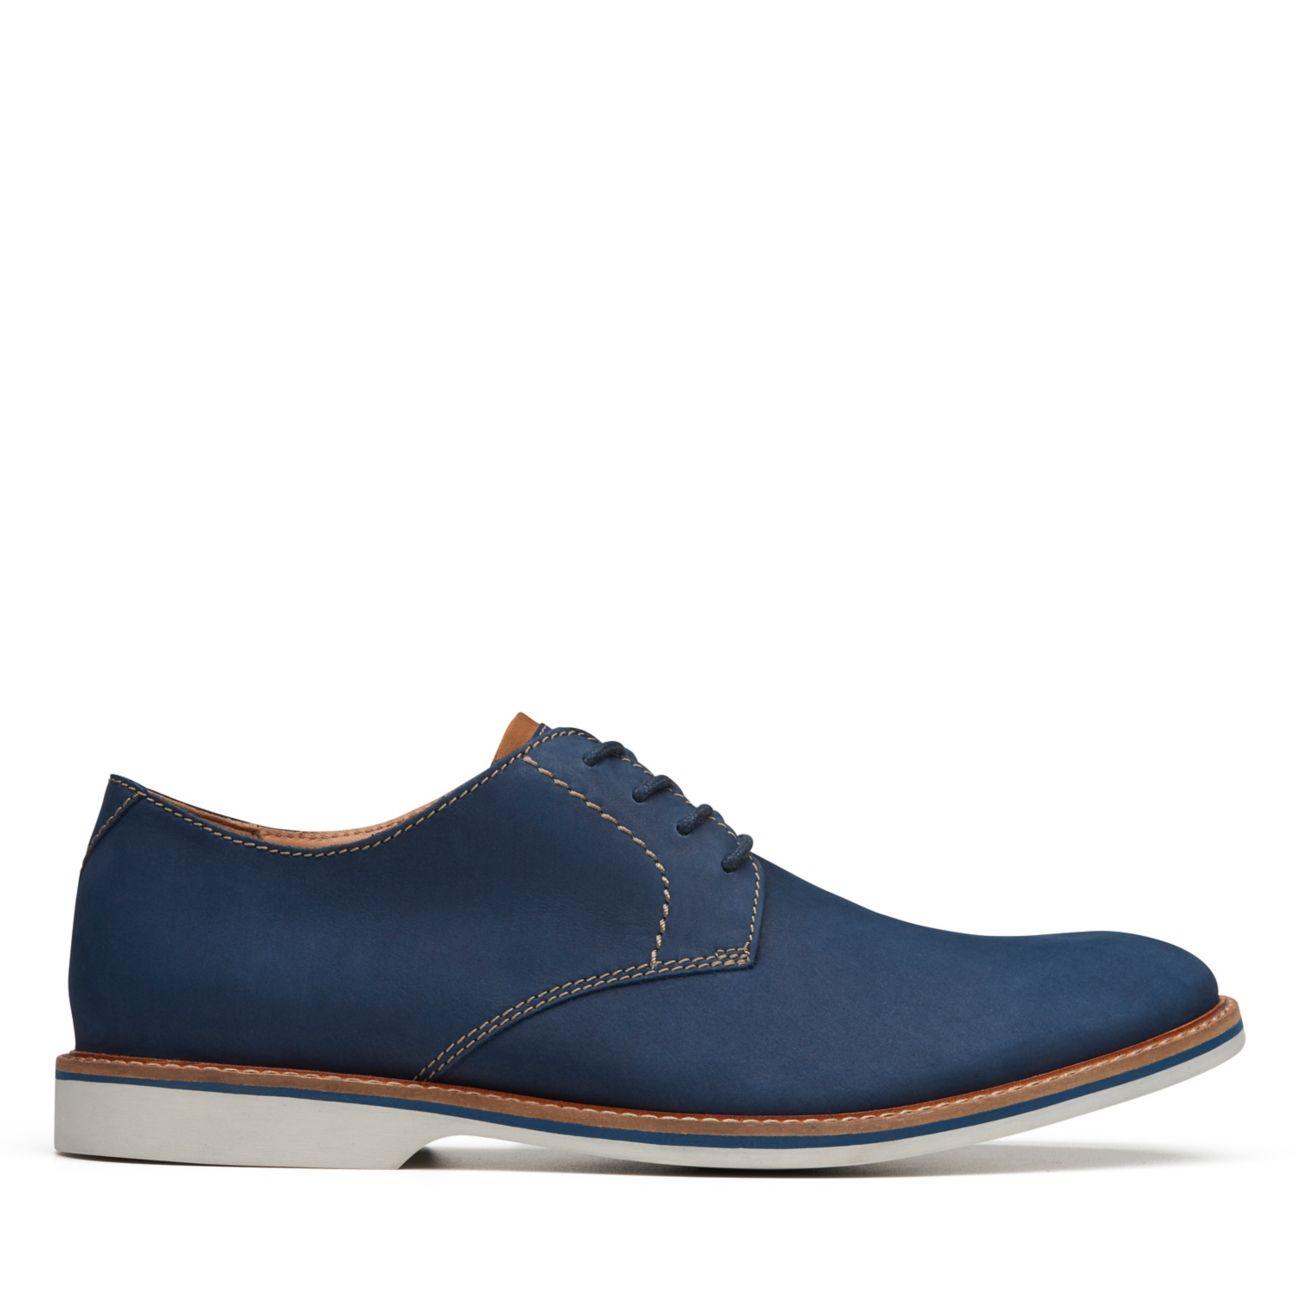 61850604db456a Atticus Lace Navy Nubuck - Men's Oxford Shoes - Clarks® Shoes Official Site  | Clarks